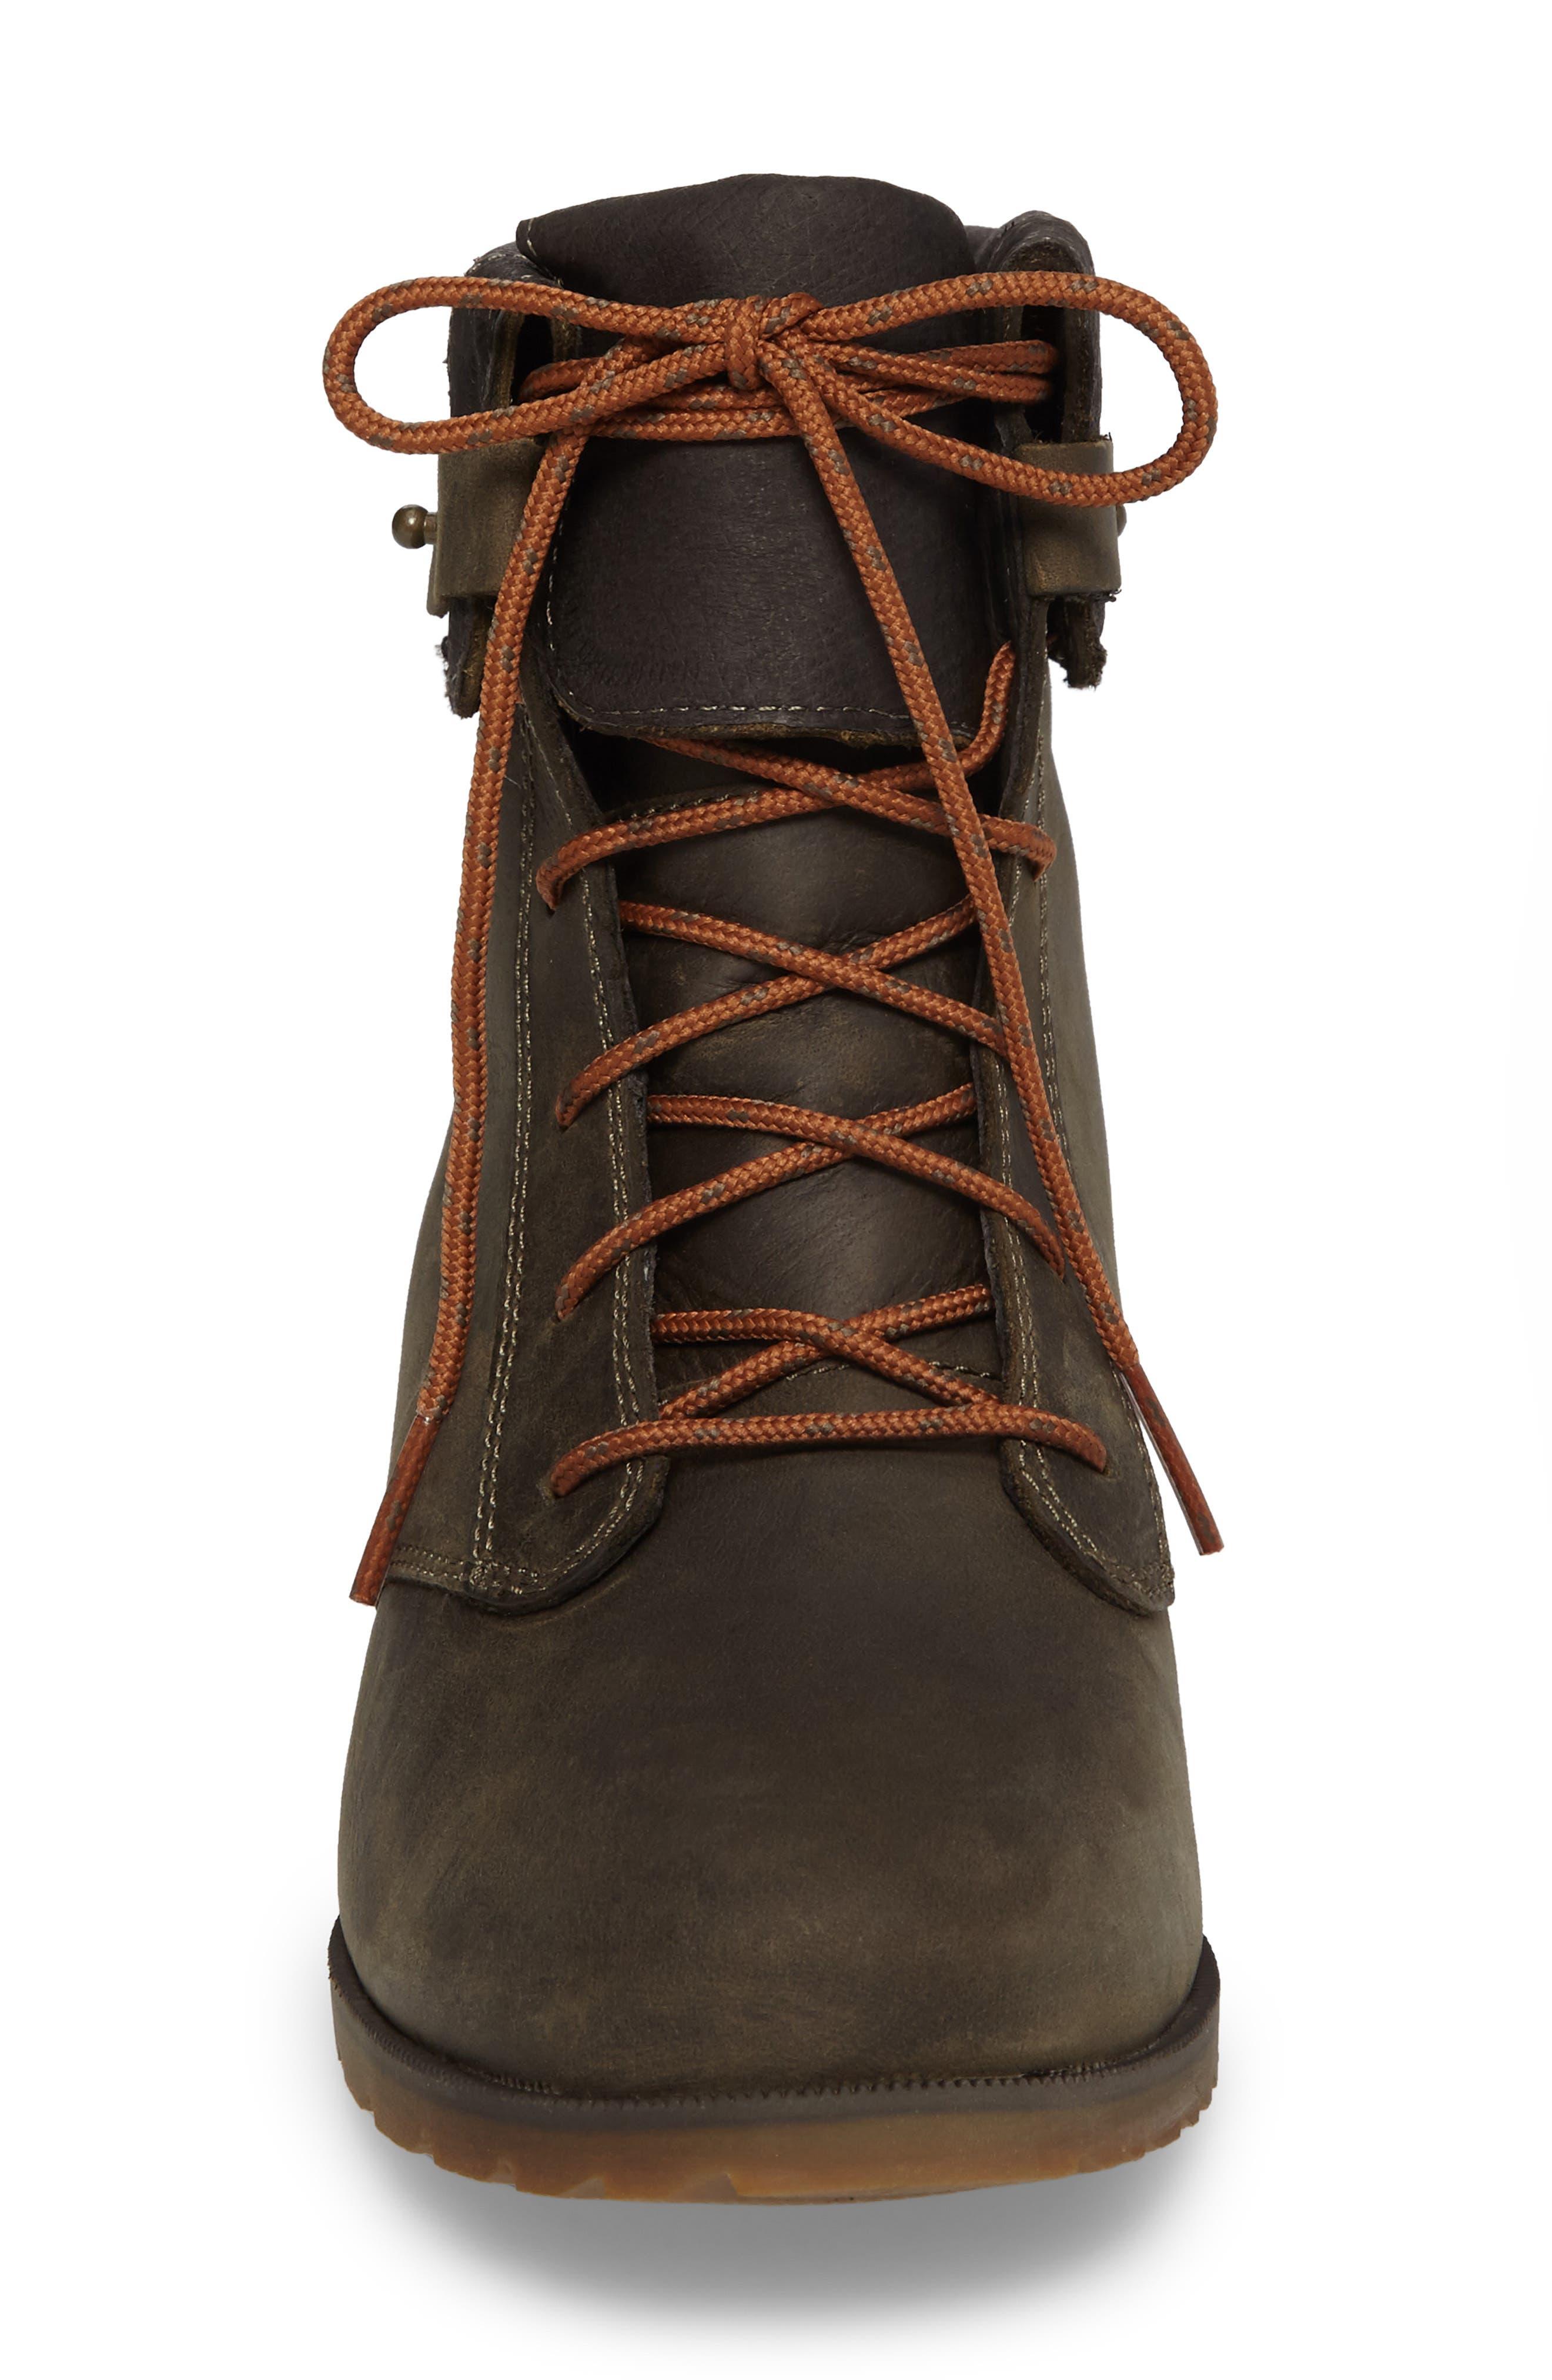 'De La Vina' Waterproof Lace-Up Boot,                             Alternate thumbnail 4, color,                             Dark Olive Leather